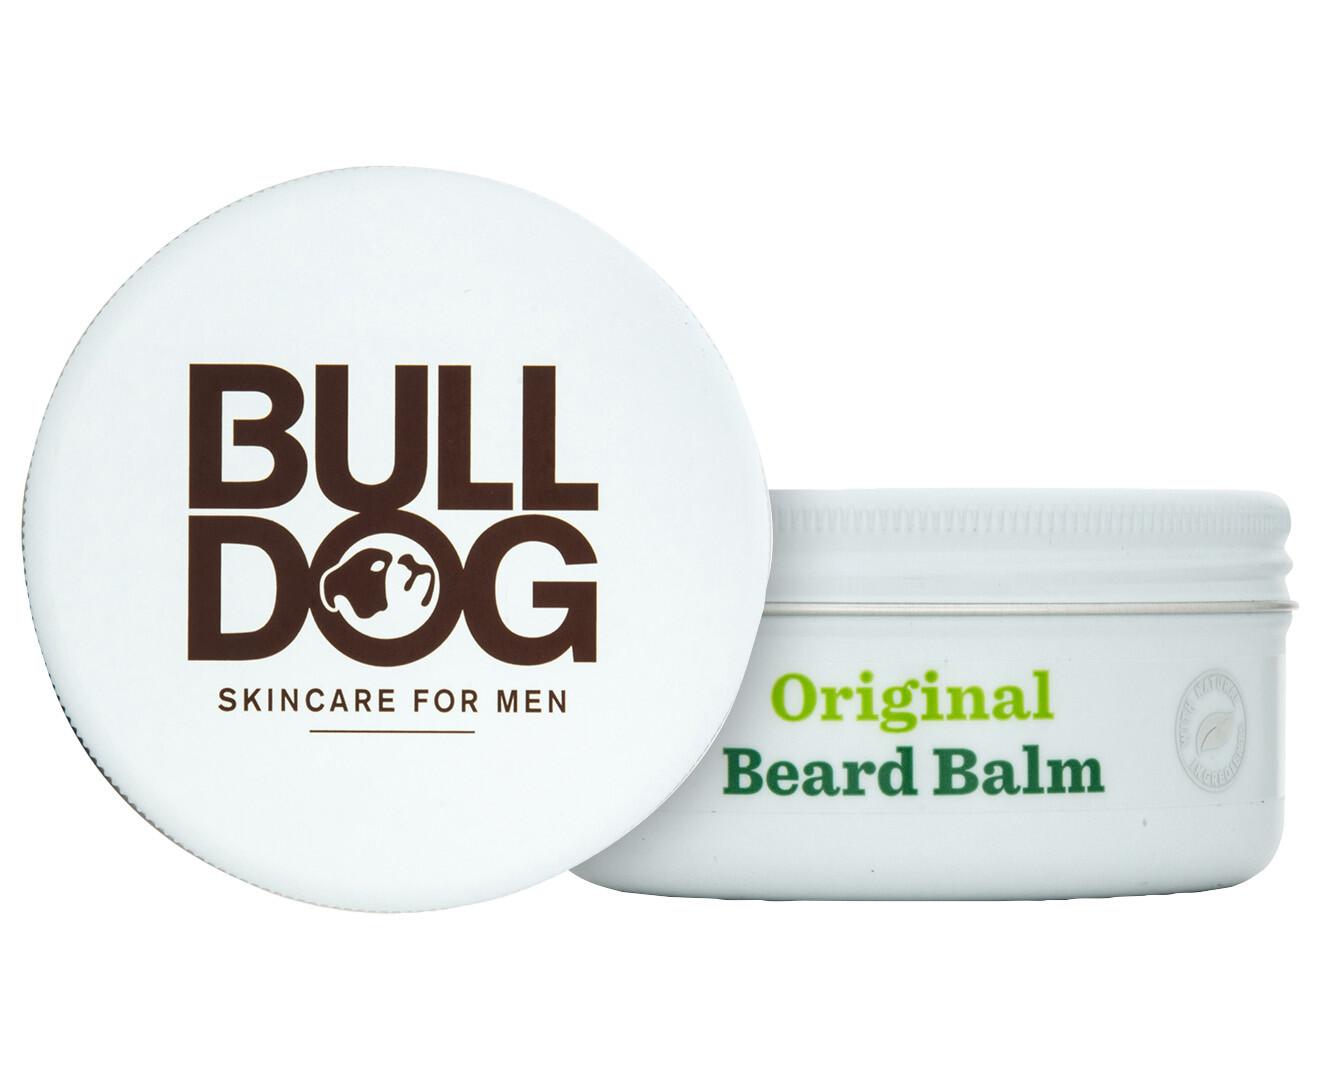 Original Beard Balm (Jar) - Bulldog